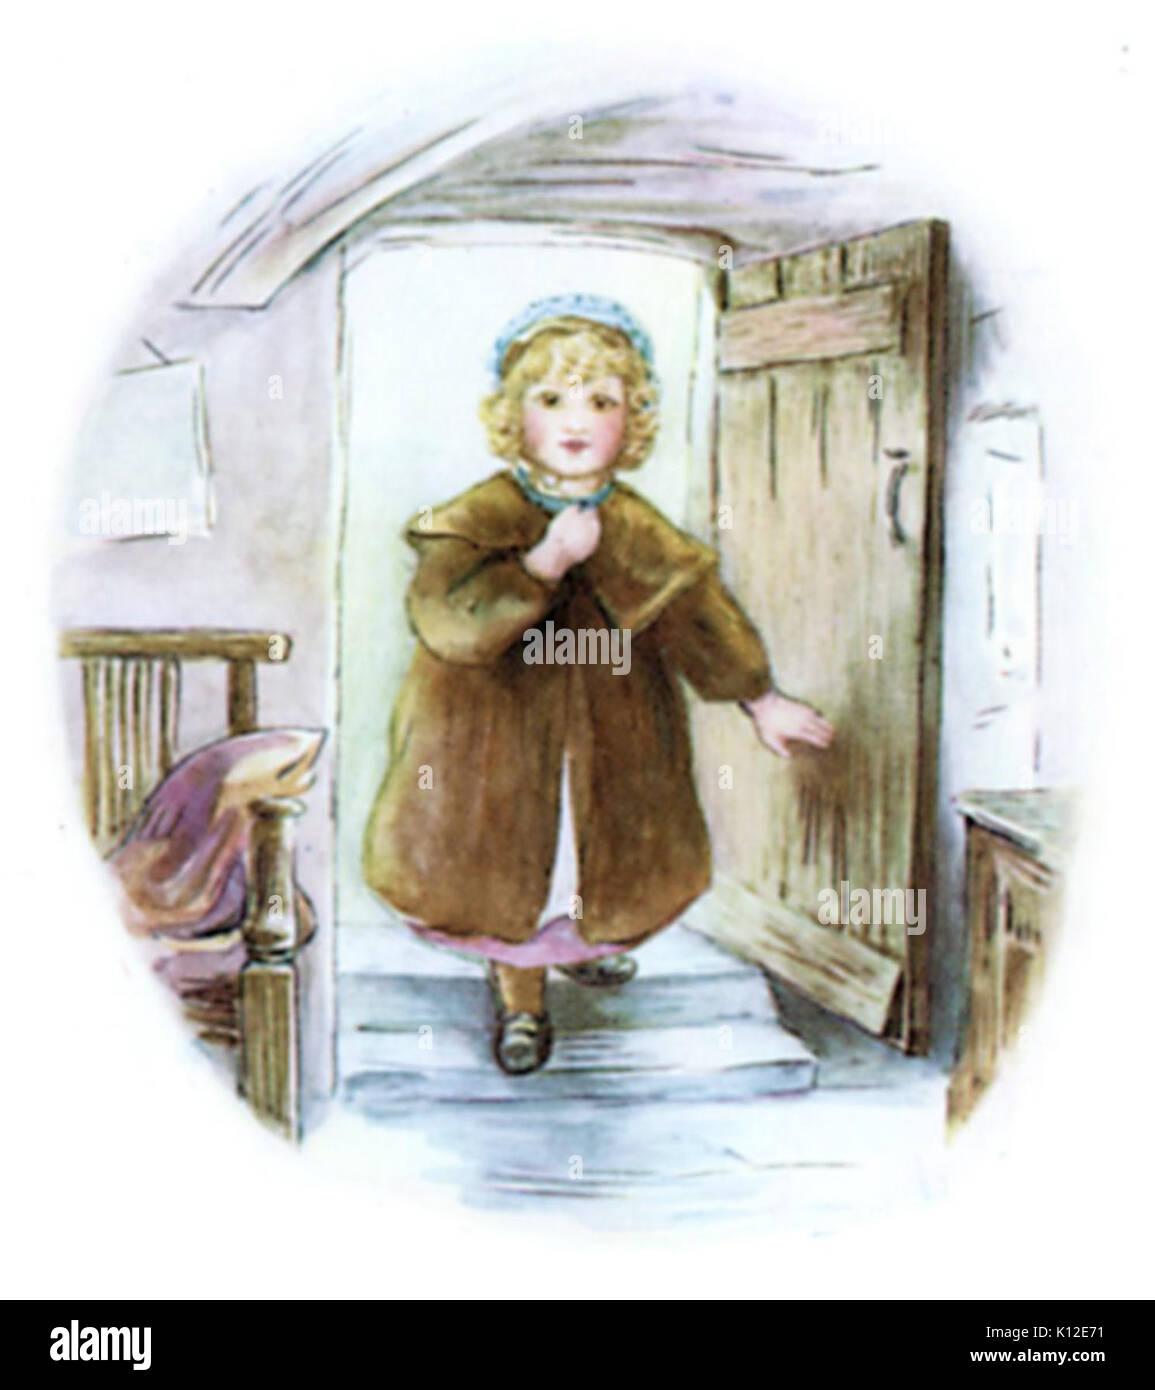 Beatrix Potter, Mrs Tiggy Winkle, Lucie enters - Stock Image